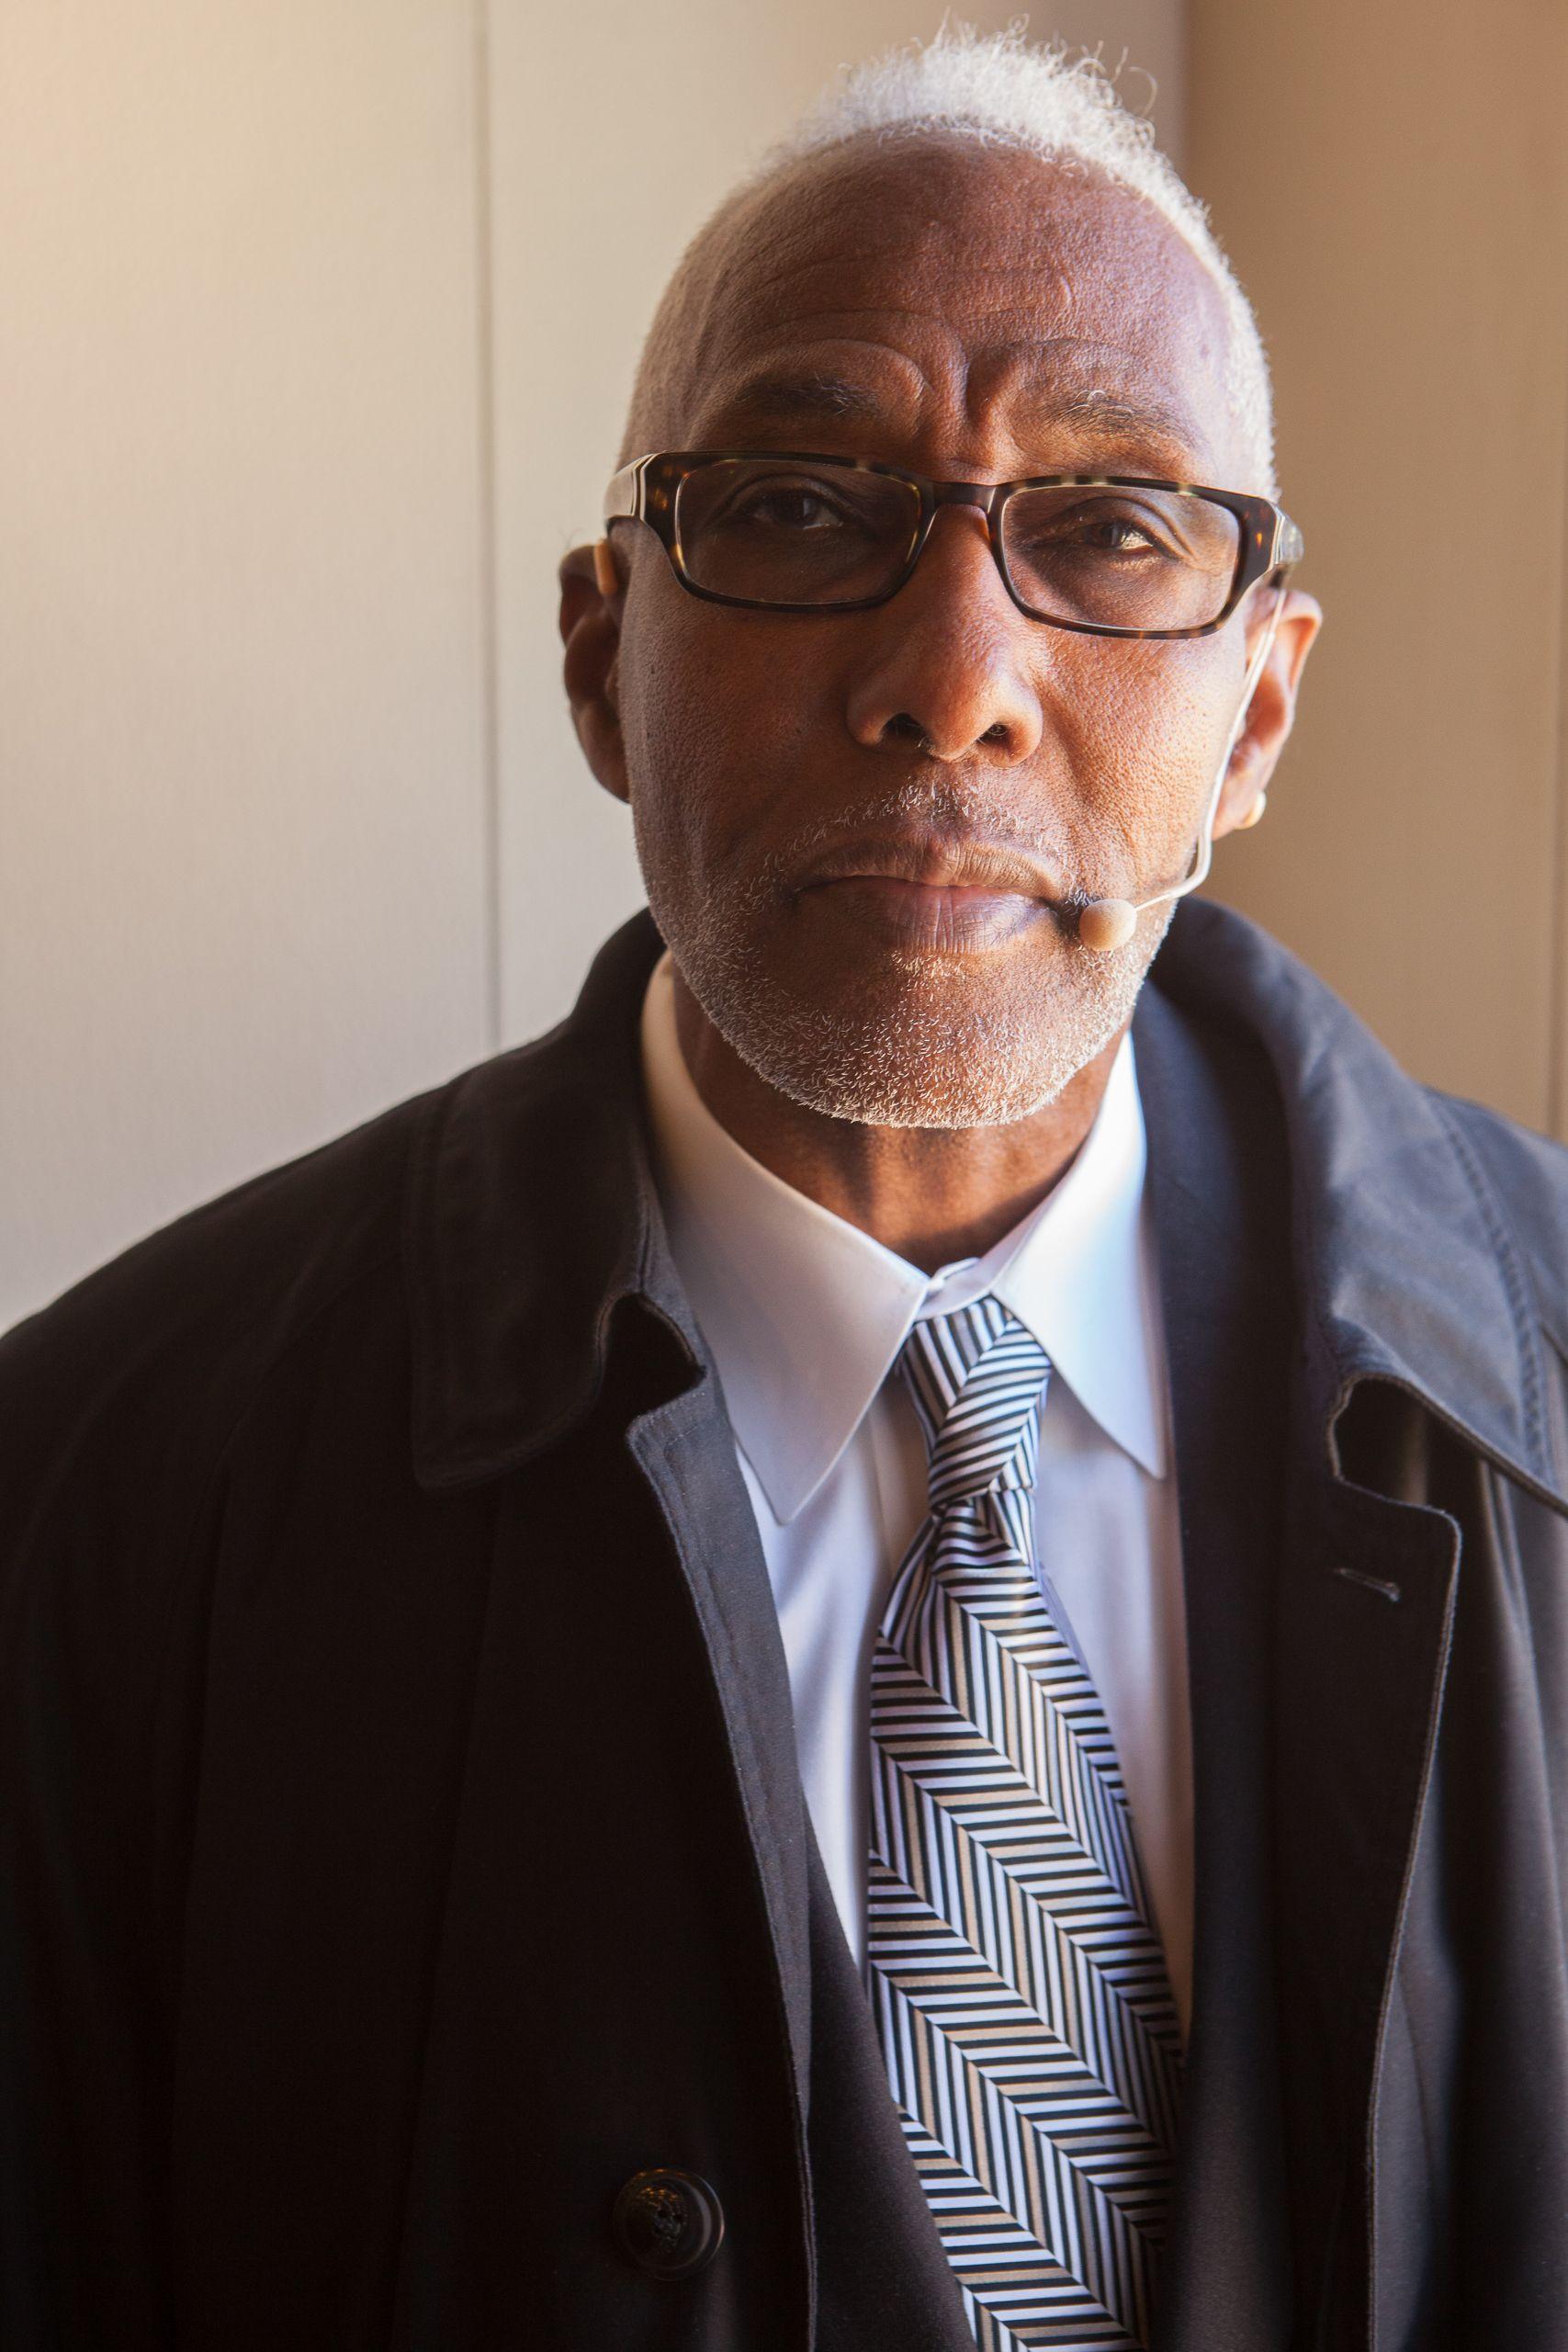 Pastor Willie L. Monnet by doorway